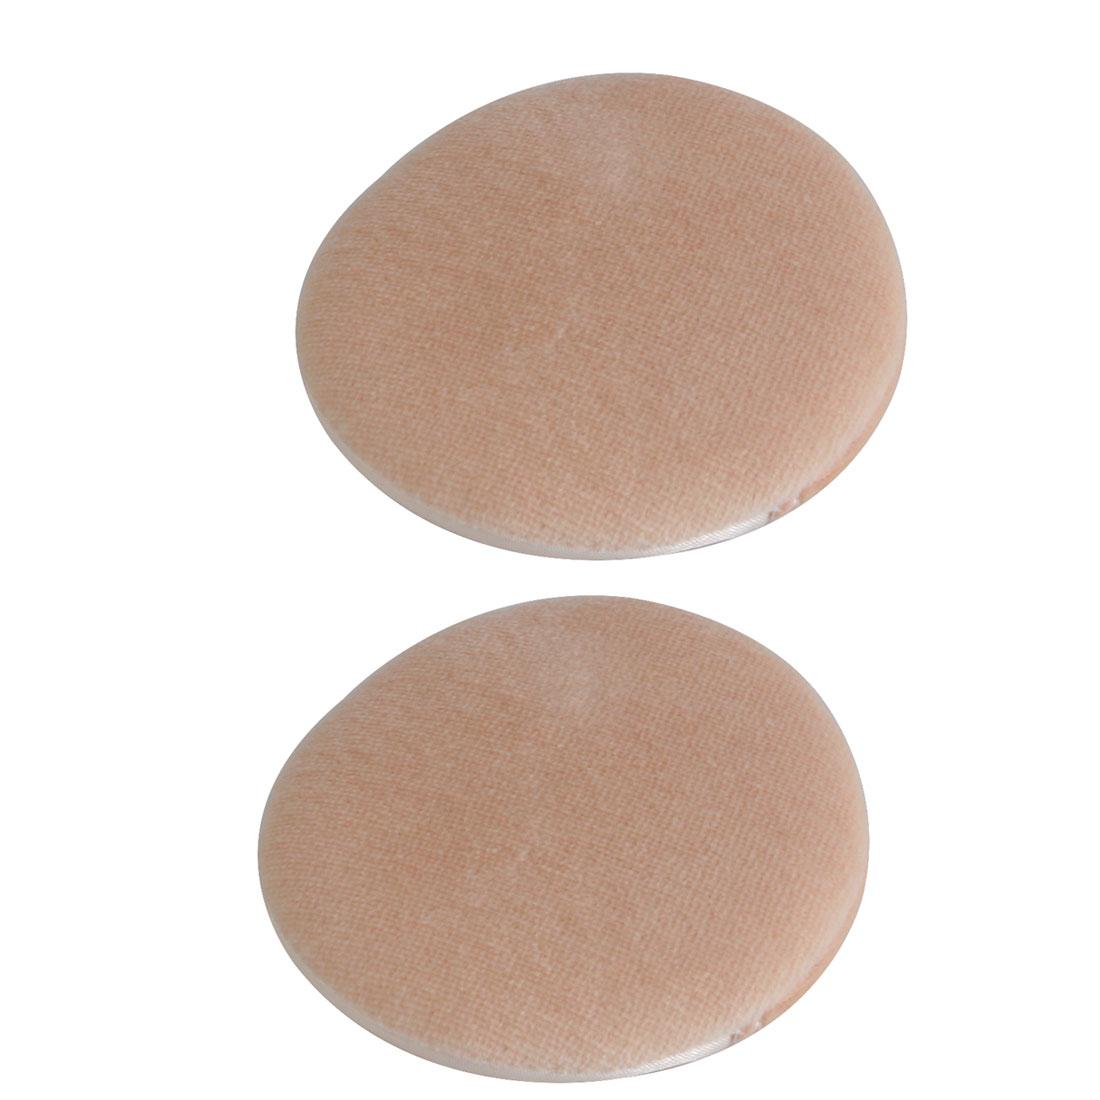 Women Sponge Round Facial Face Cosmetic Makeup Foundation Powder Puff Champagne Color 2pcs